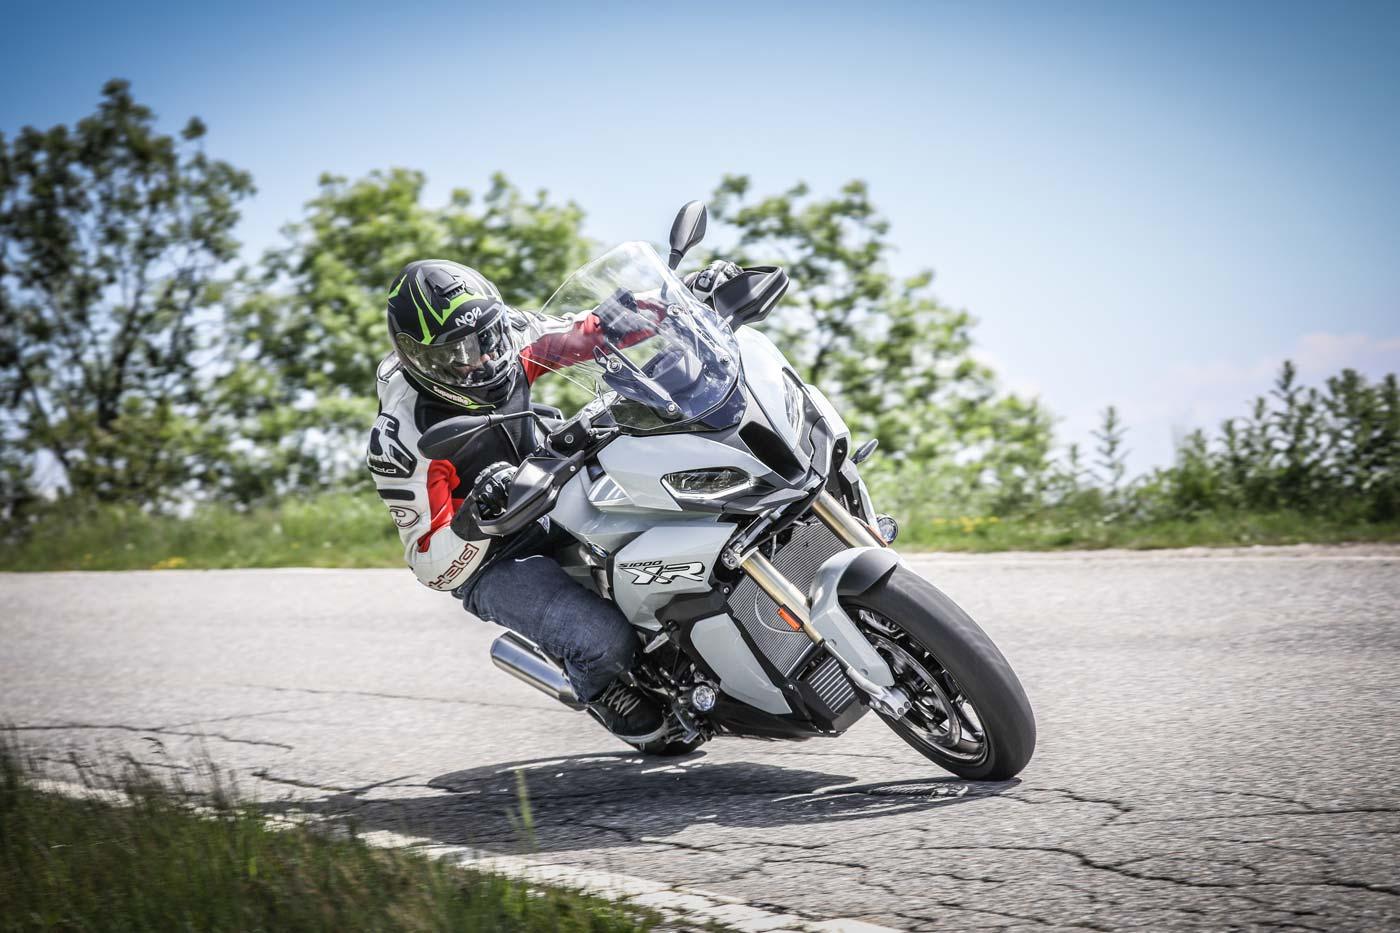 motogiro Ber Racing luglio 2020